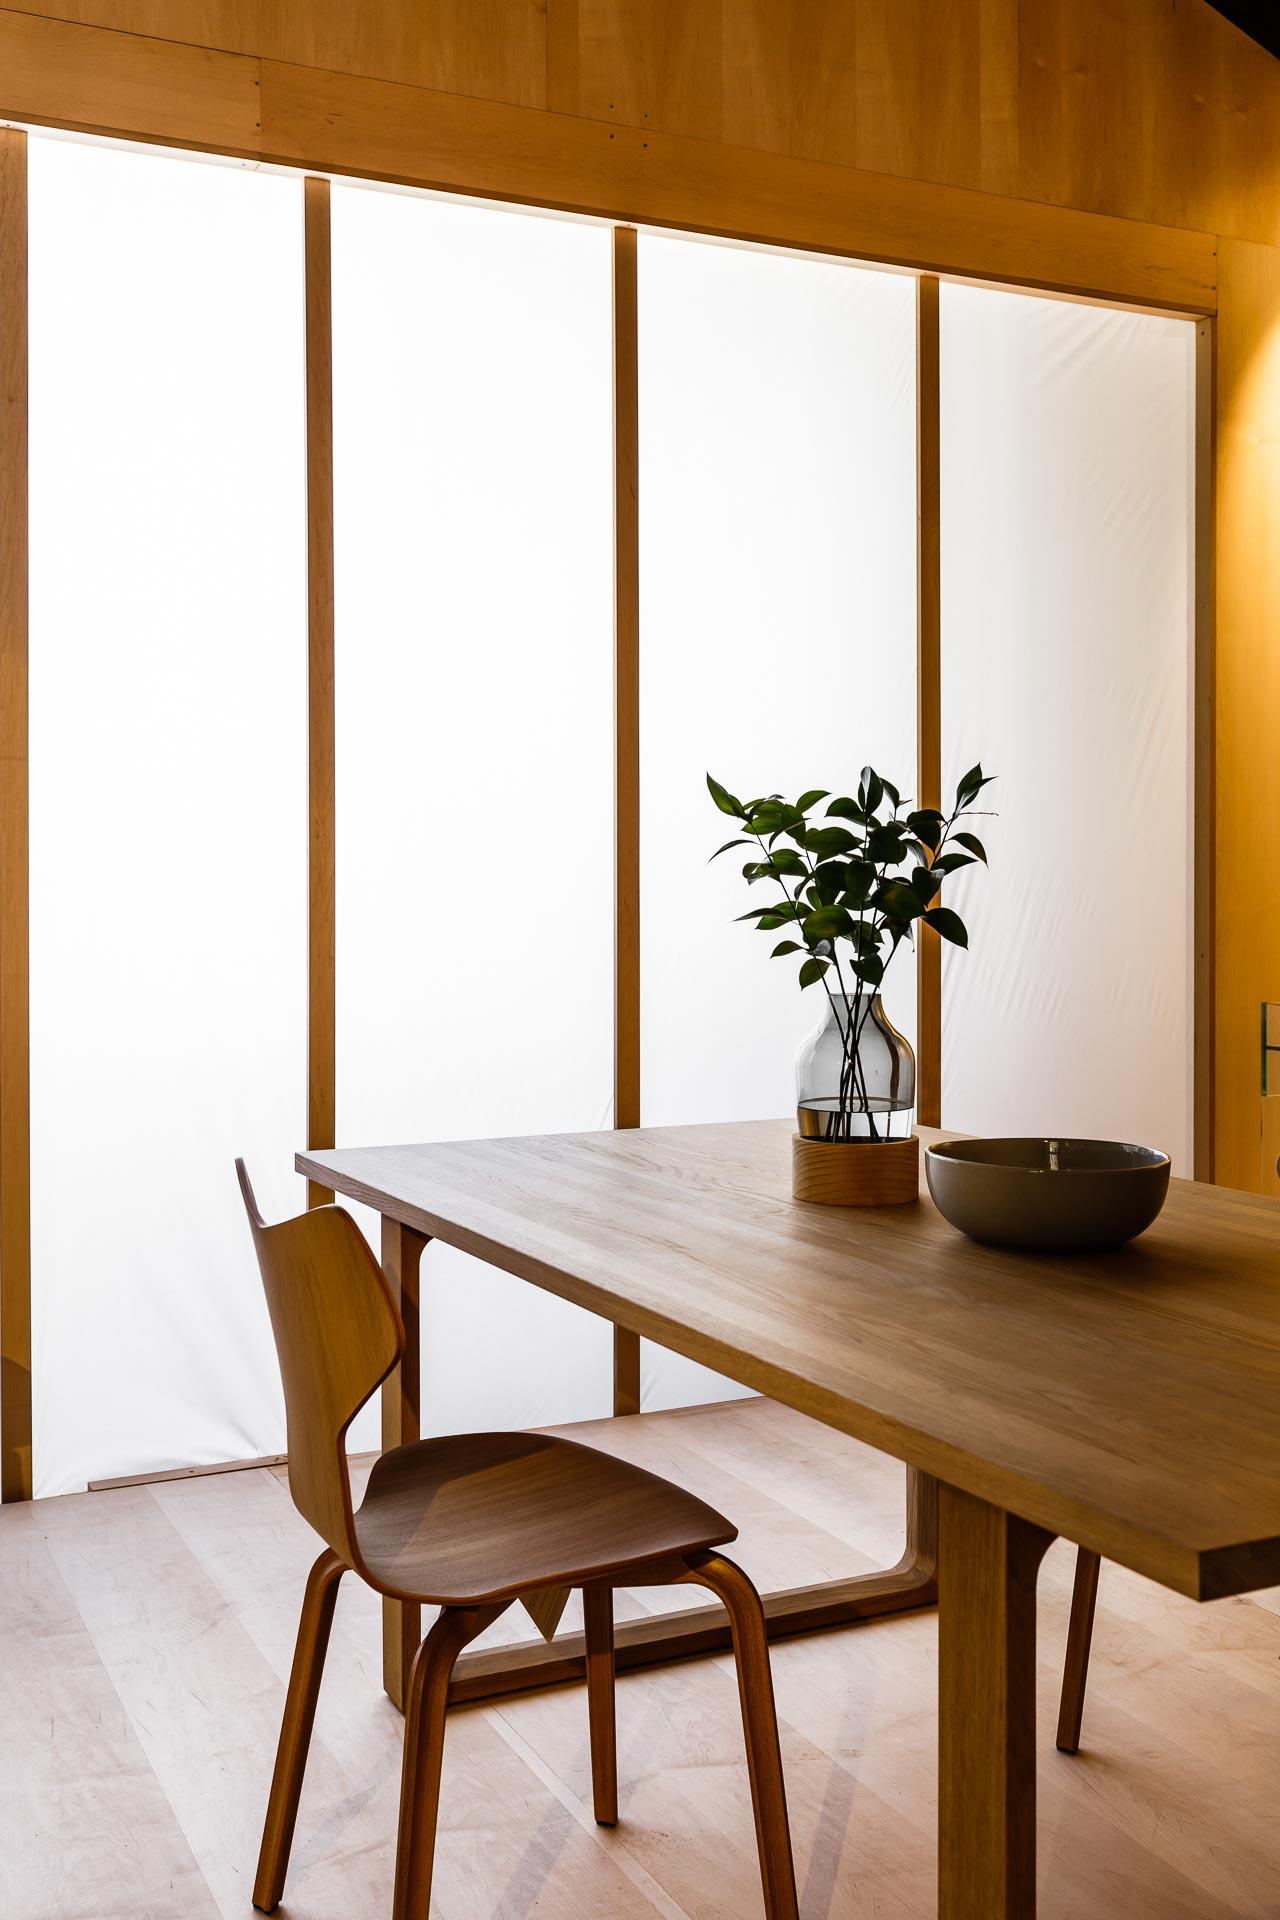 WEB - Architectural Photography Sydney - Open House Perth 2017 - Sebastian Photography 71.jpg